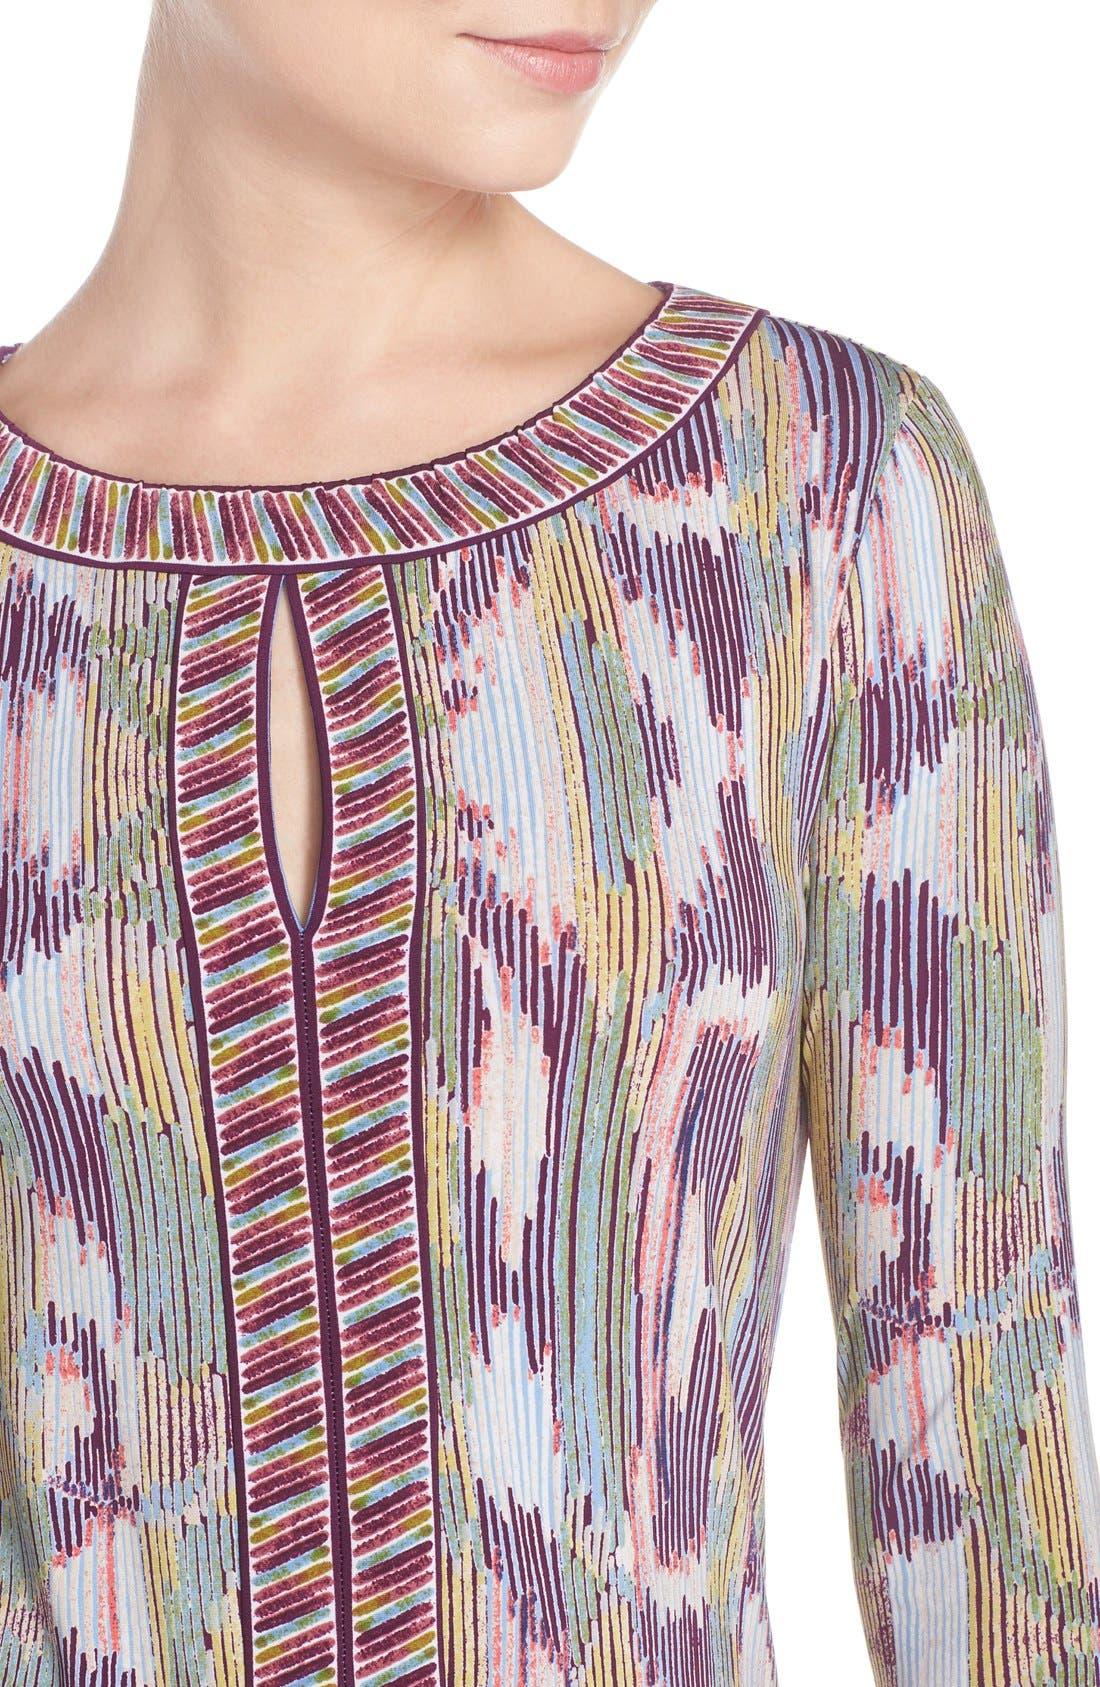 'Tawnya' Print Jersey Dress,                             Alternate thumbnail 3, color,                             590